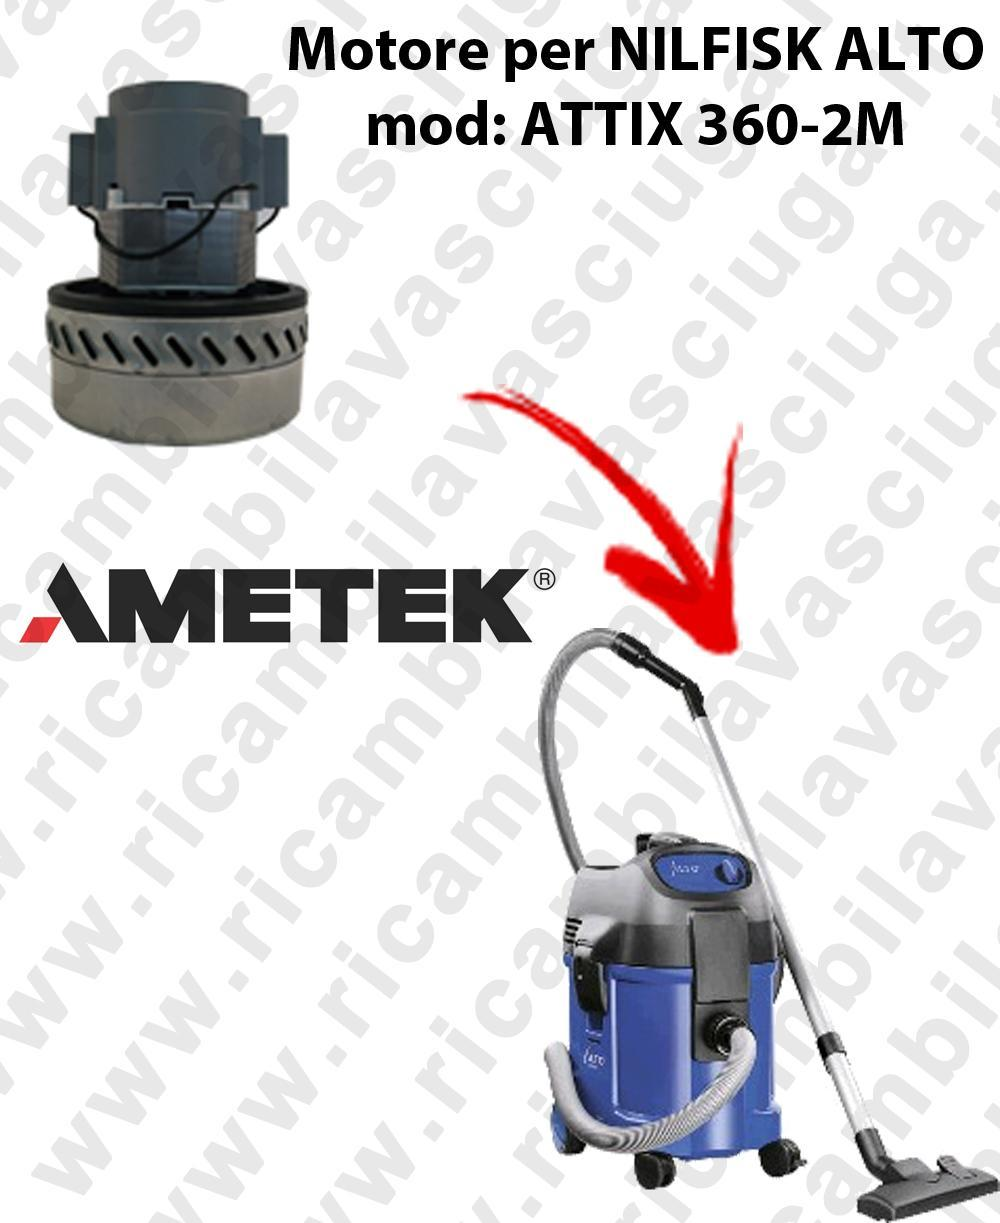 ATTIX 360-2M Ametek Vacuum Motor for vacuum cleaner NILFISK ALTO